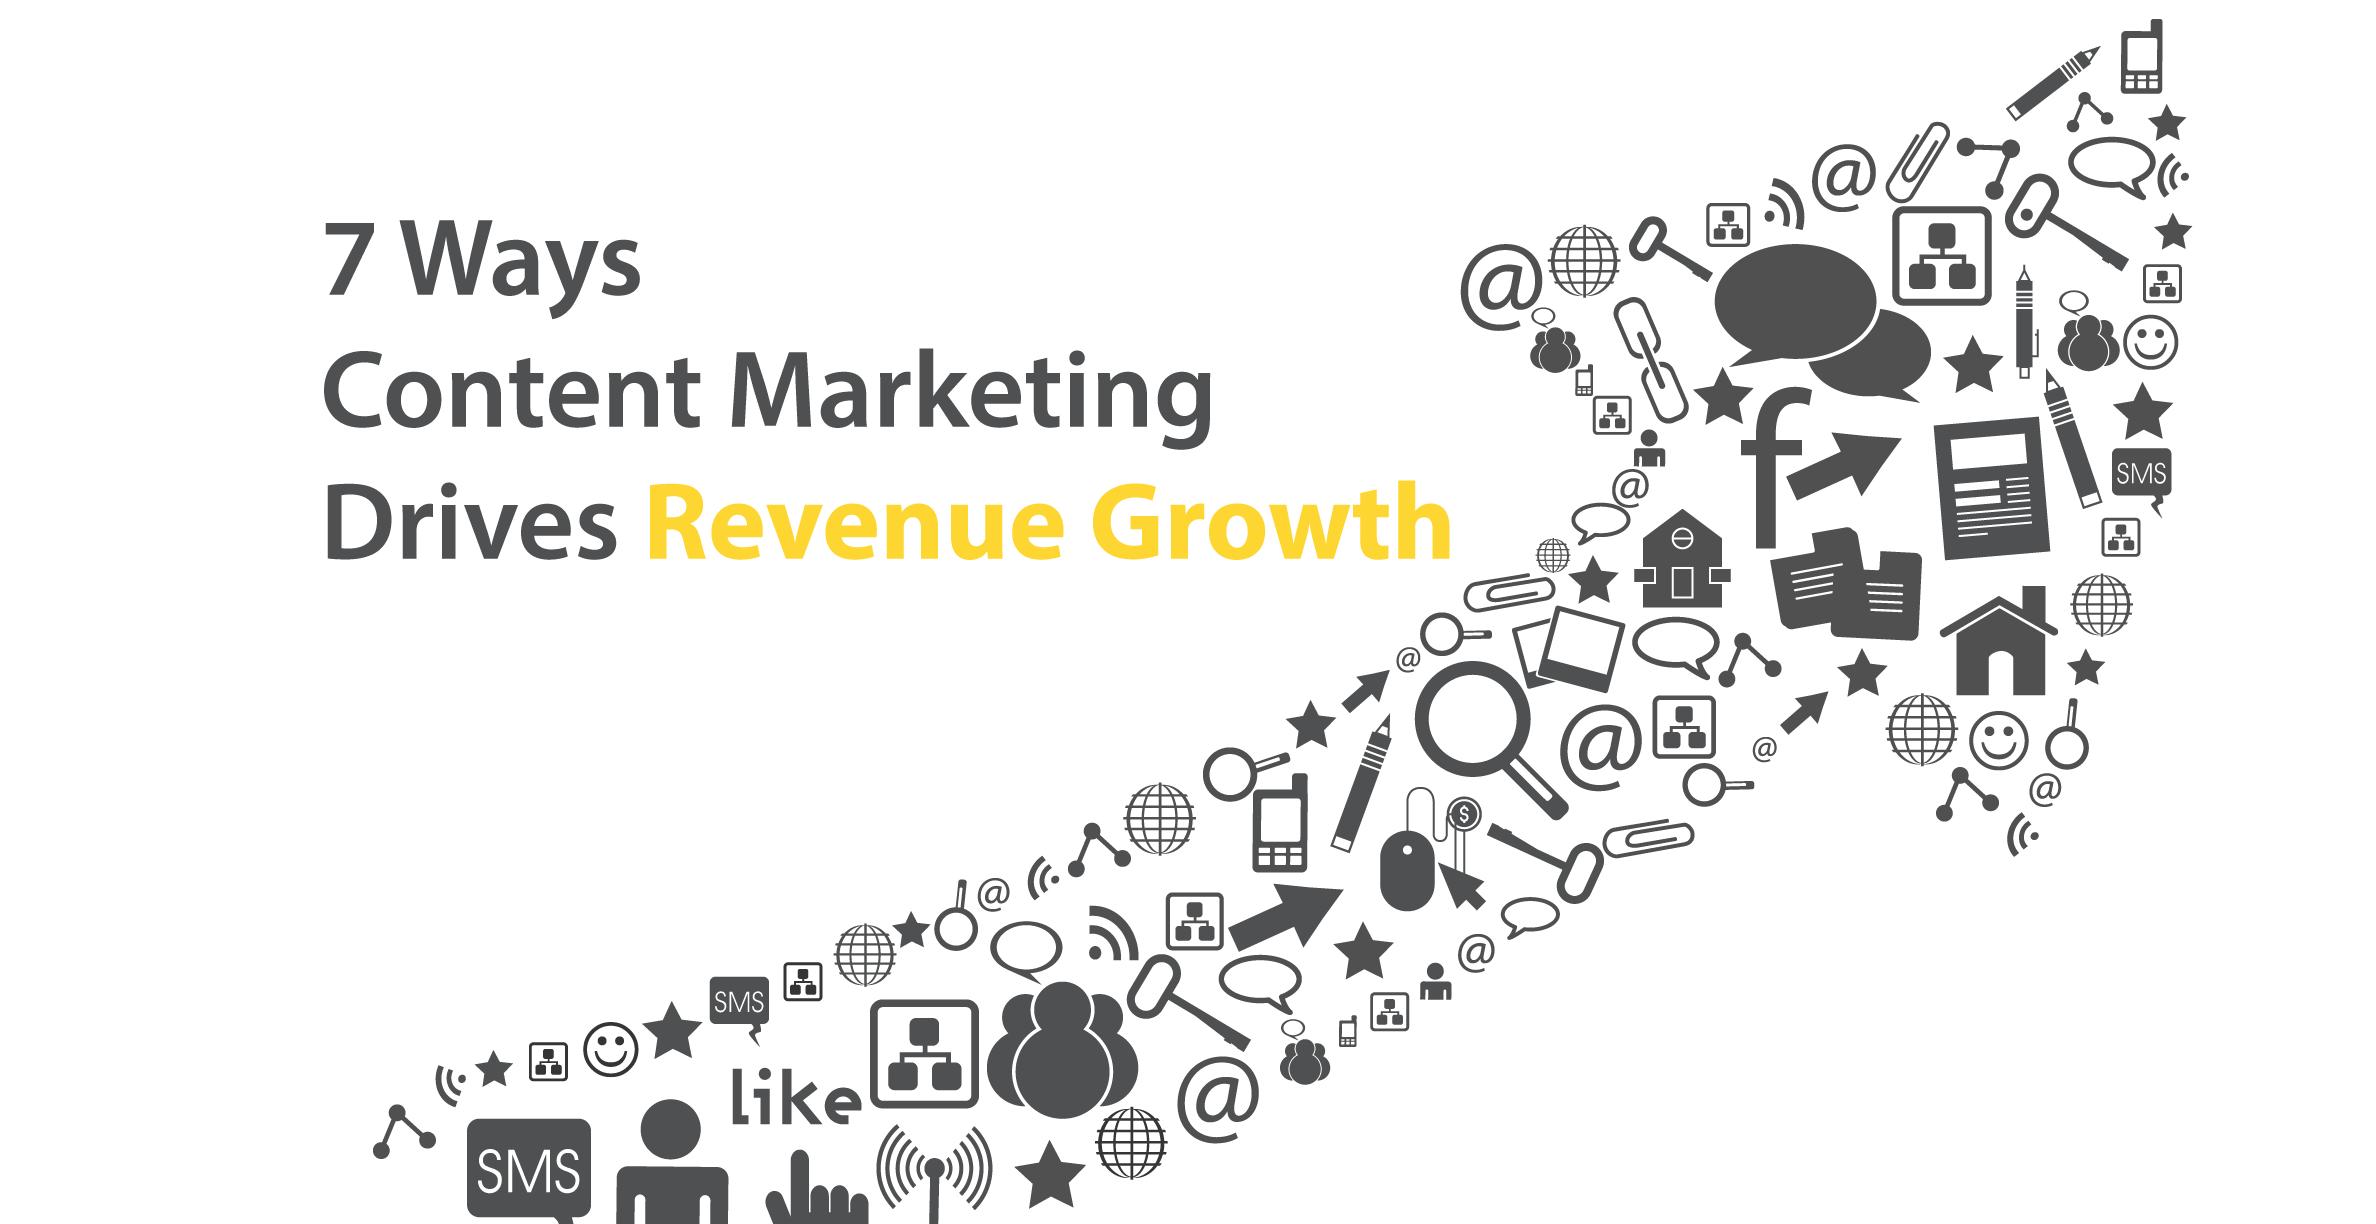 7 Ways Content Marketing Drives Revenue Growth